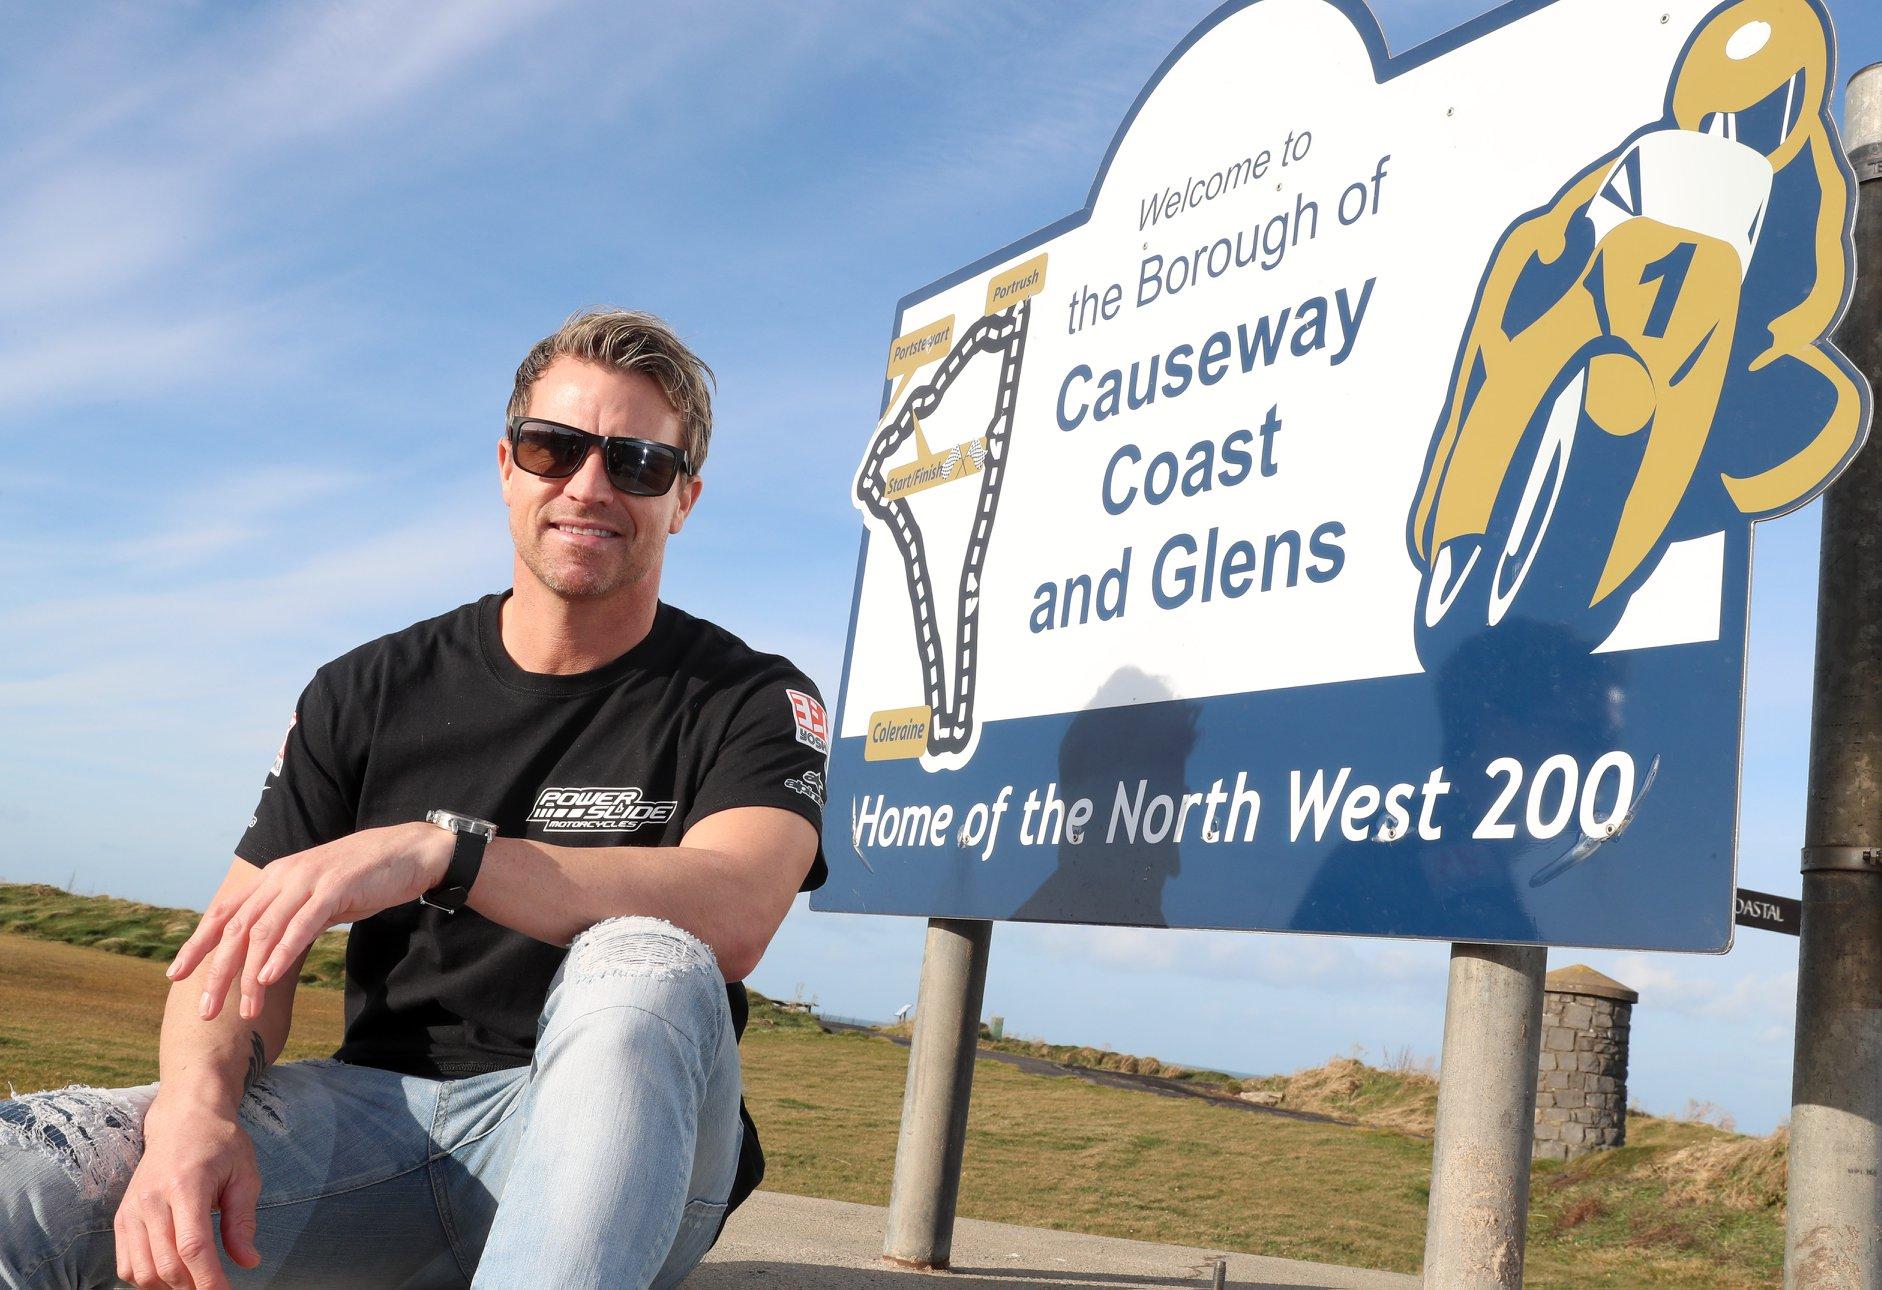 North West 200 Latest: Ex Moto GP Exponent Ellison To Join International Roads Scene